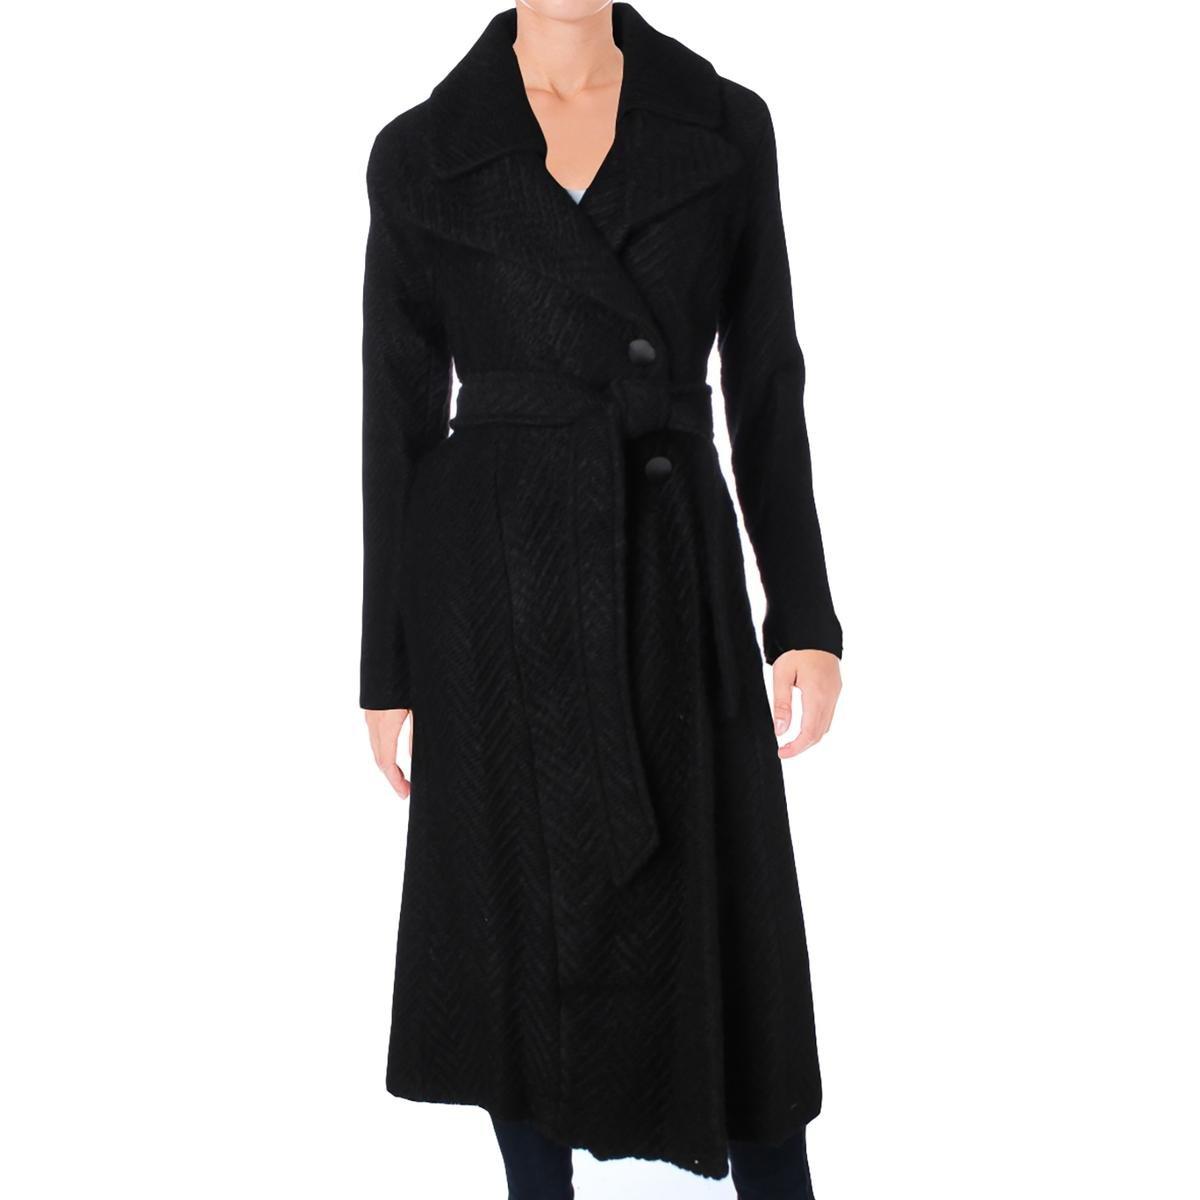 Nanette Lepore Women's Knit Herringbone Fold Over Notch Collar Maxi Coat, Black, Small